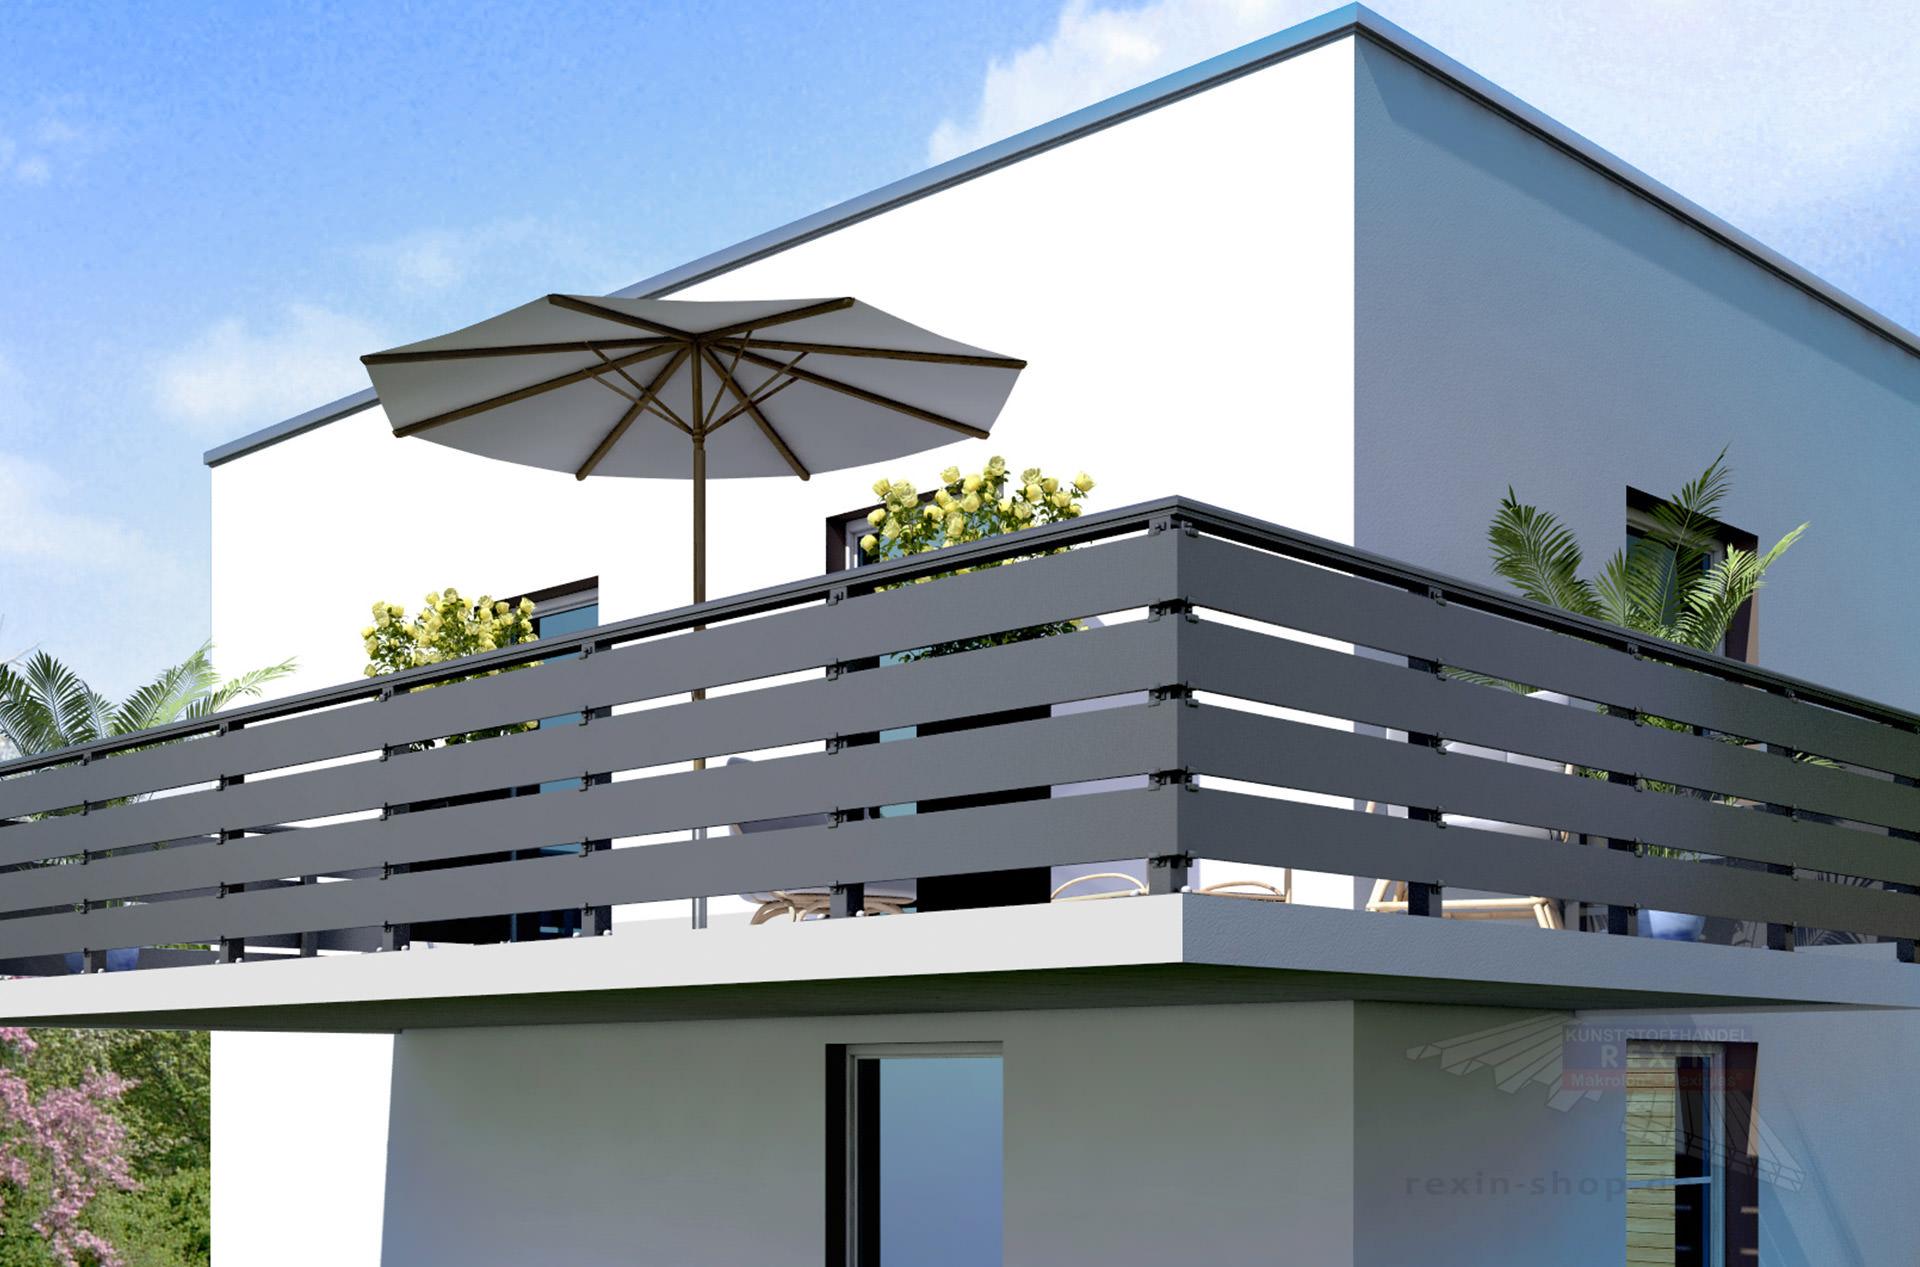 Rexoboard Alu Balkonbretter 150mm Anthrazit Mit Struktureffekt